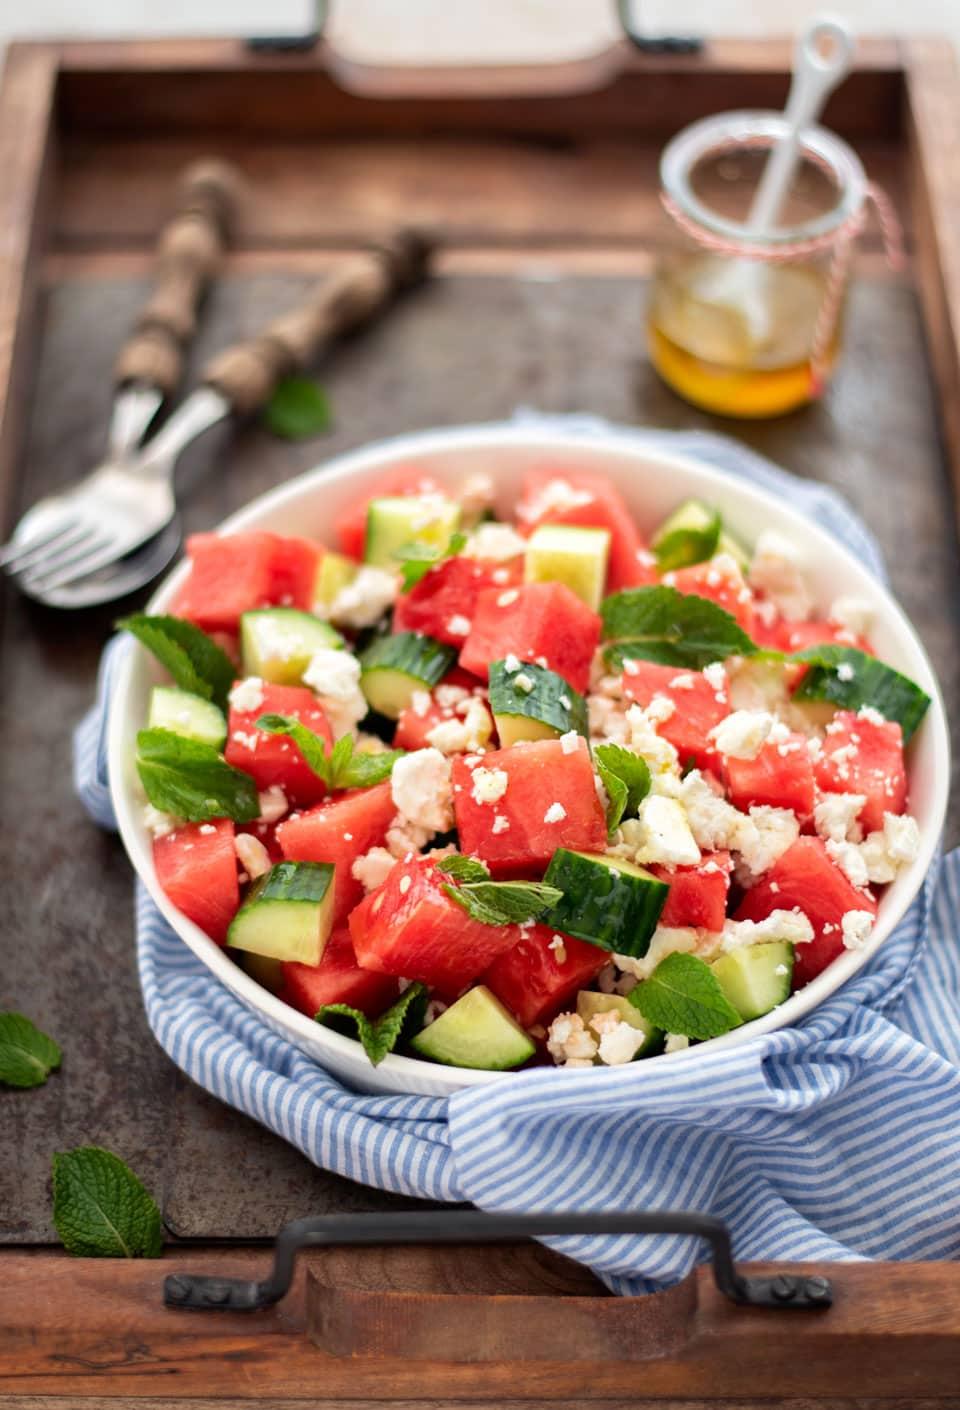 Salade van watermeloen met feta